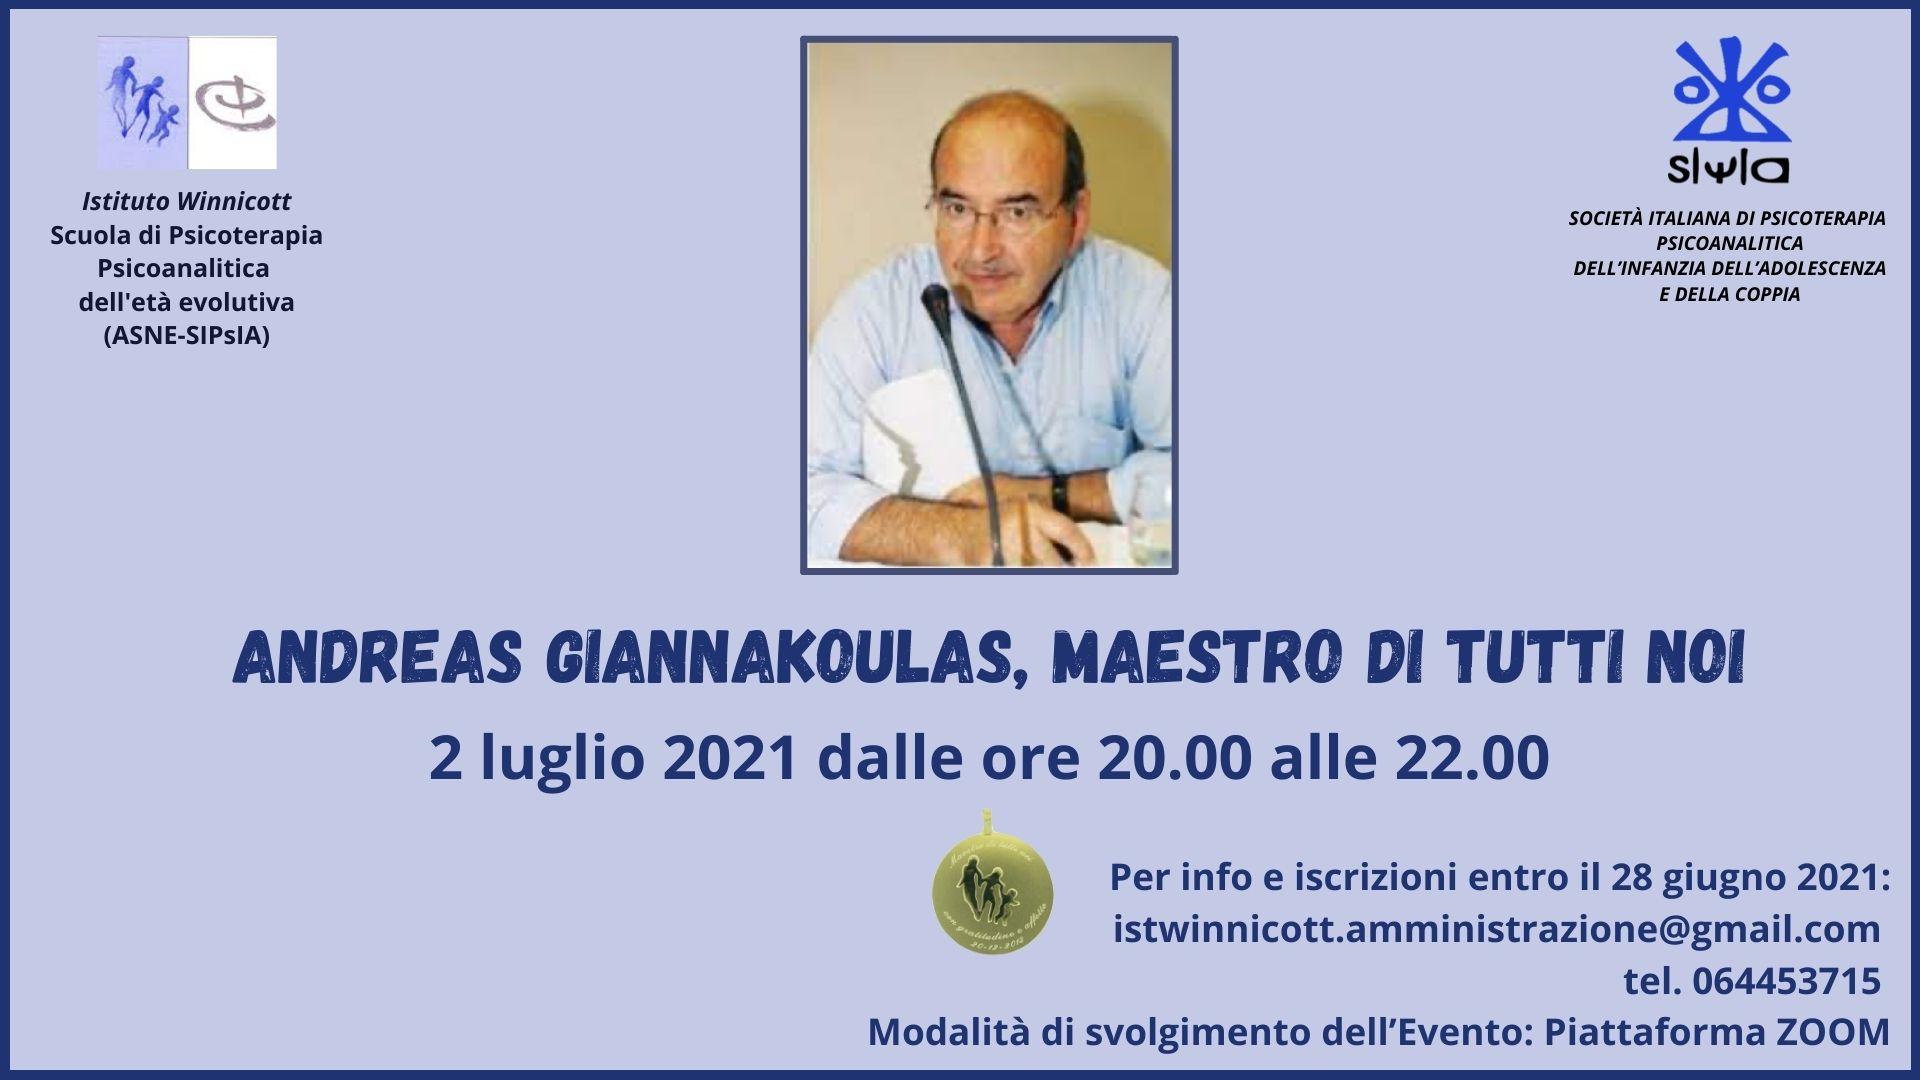 Serata dedicata ad  Andreas Giannakoulas